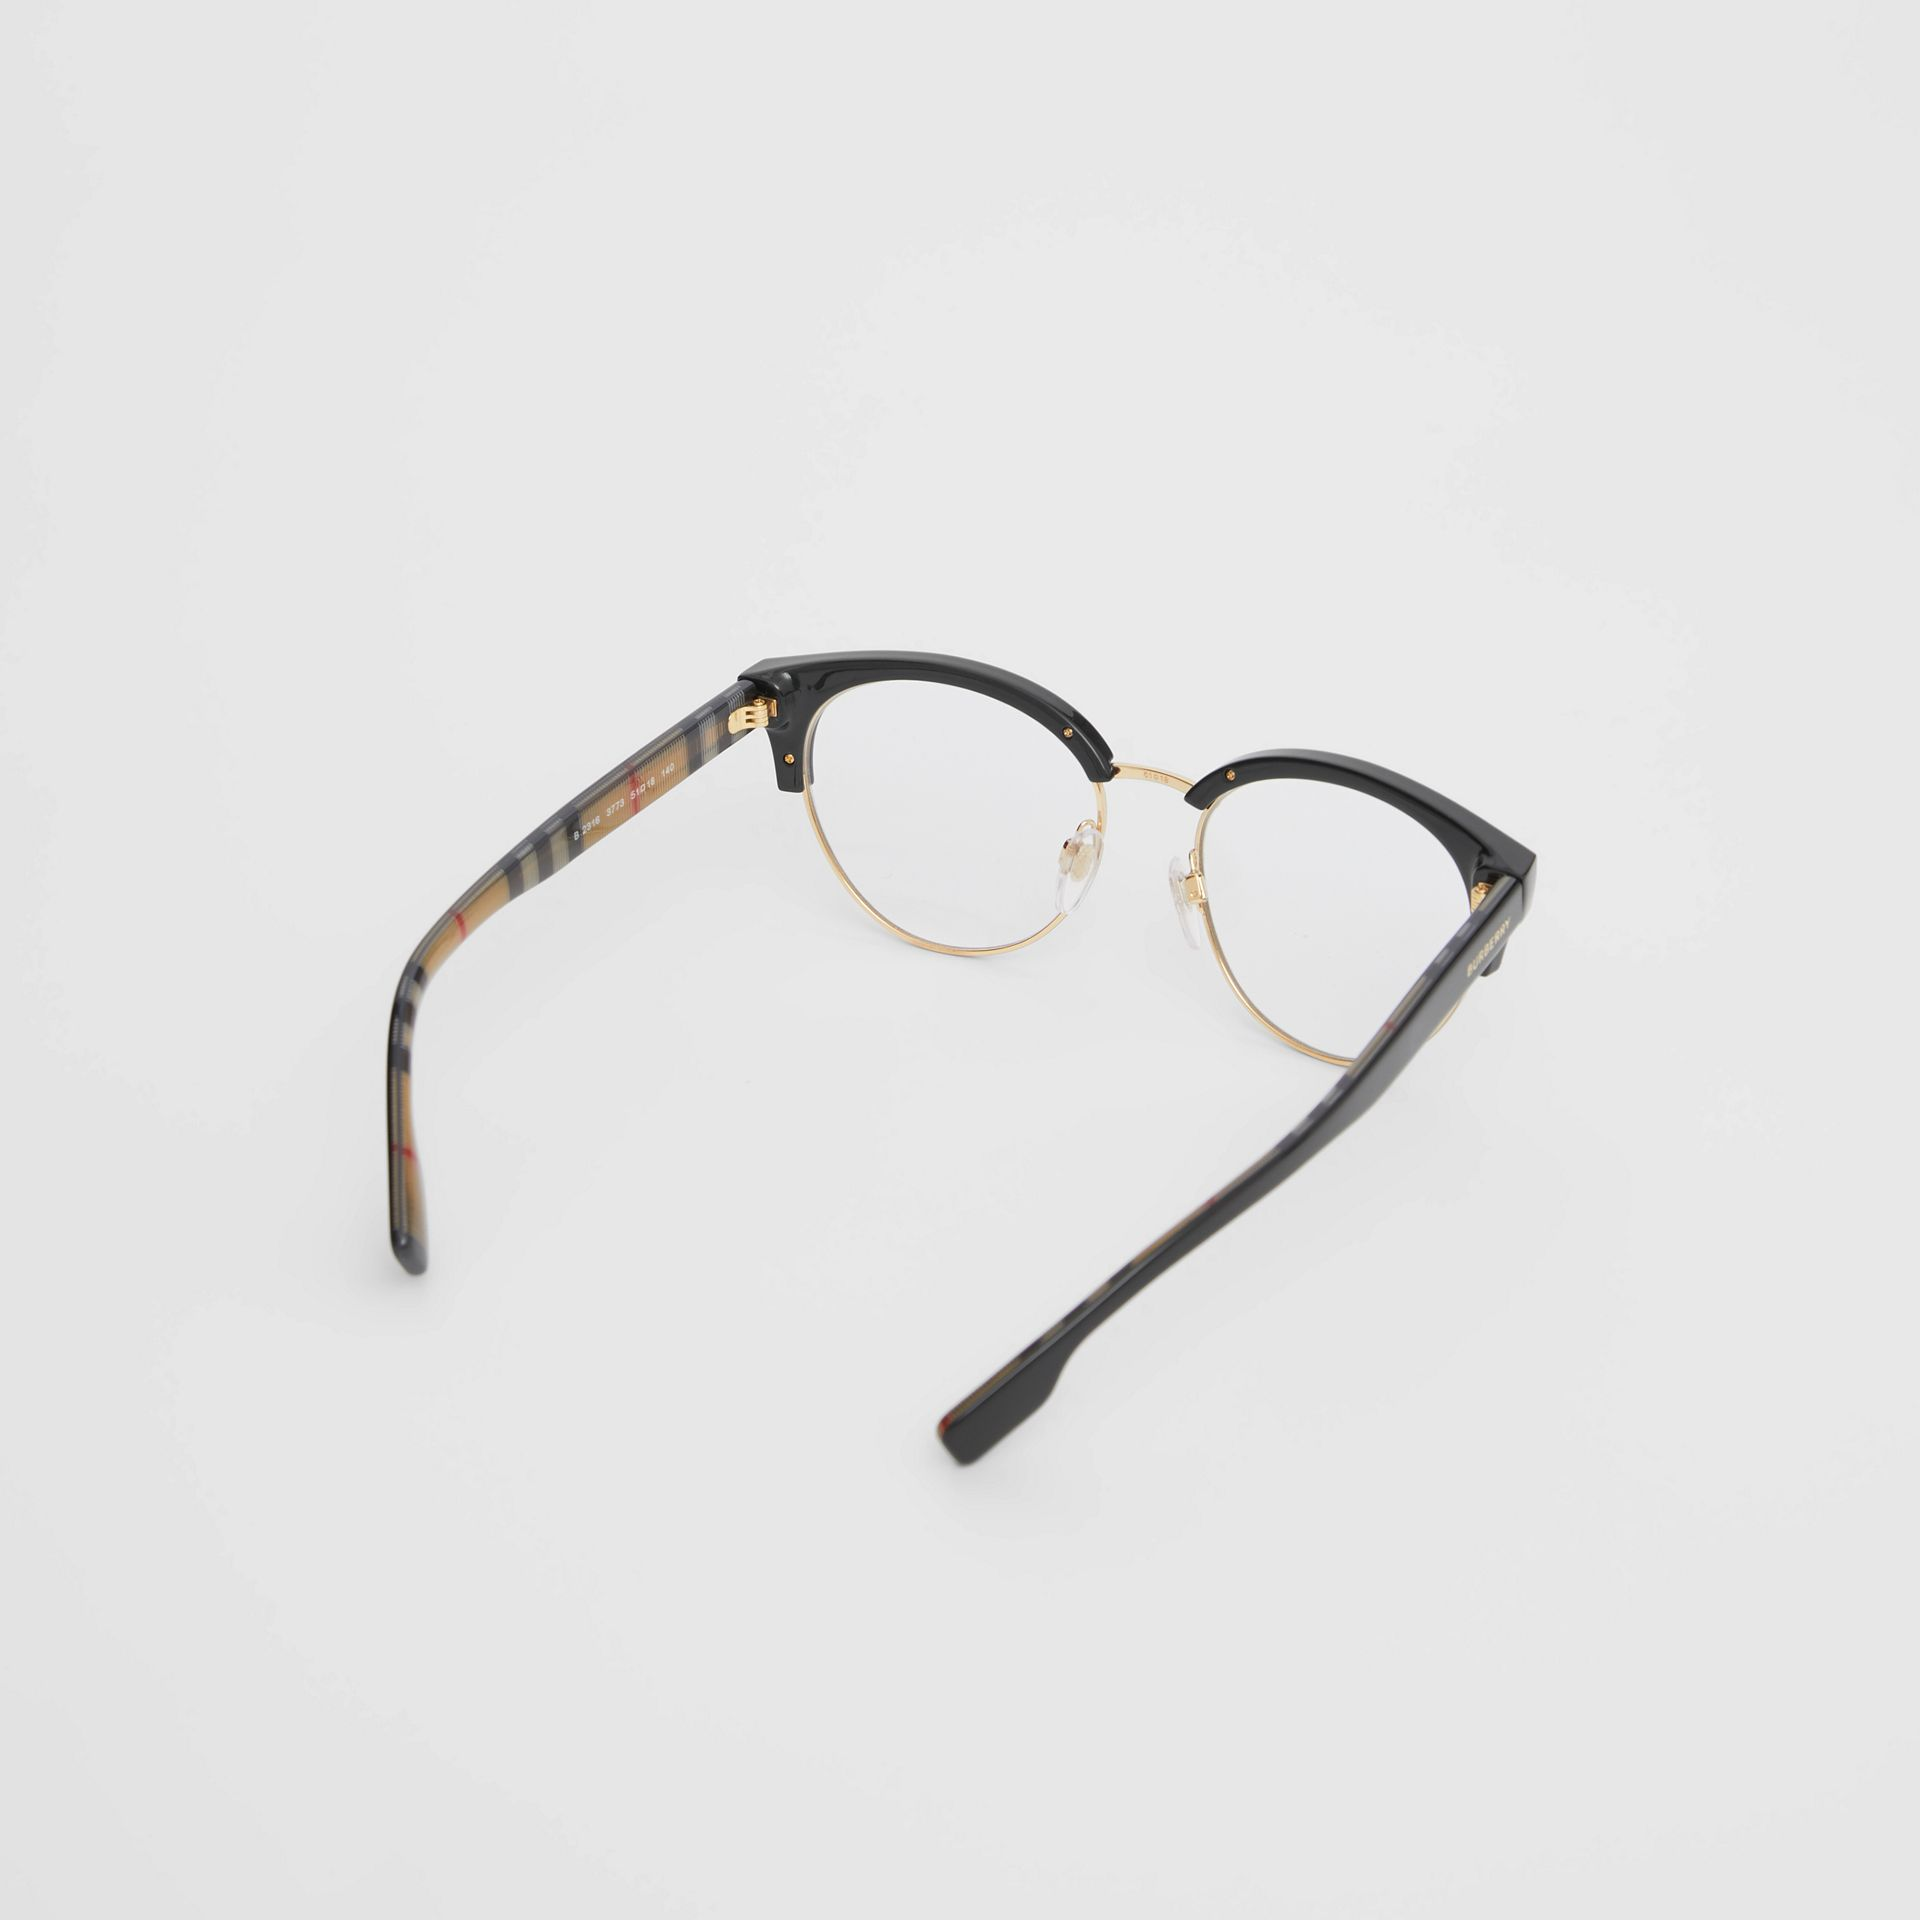 Cat-eye Optical Frames in Black/beige - Women | Burberry - gallery image 4